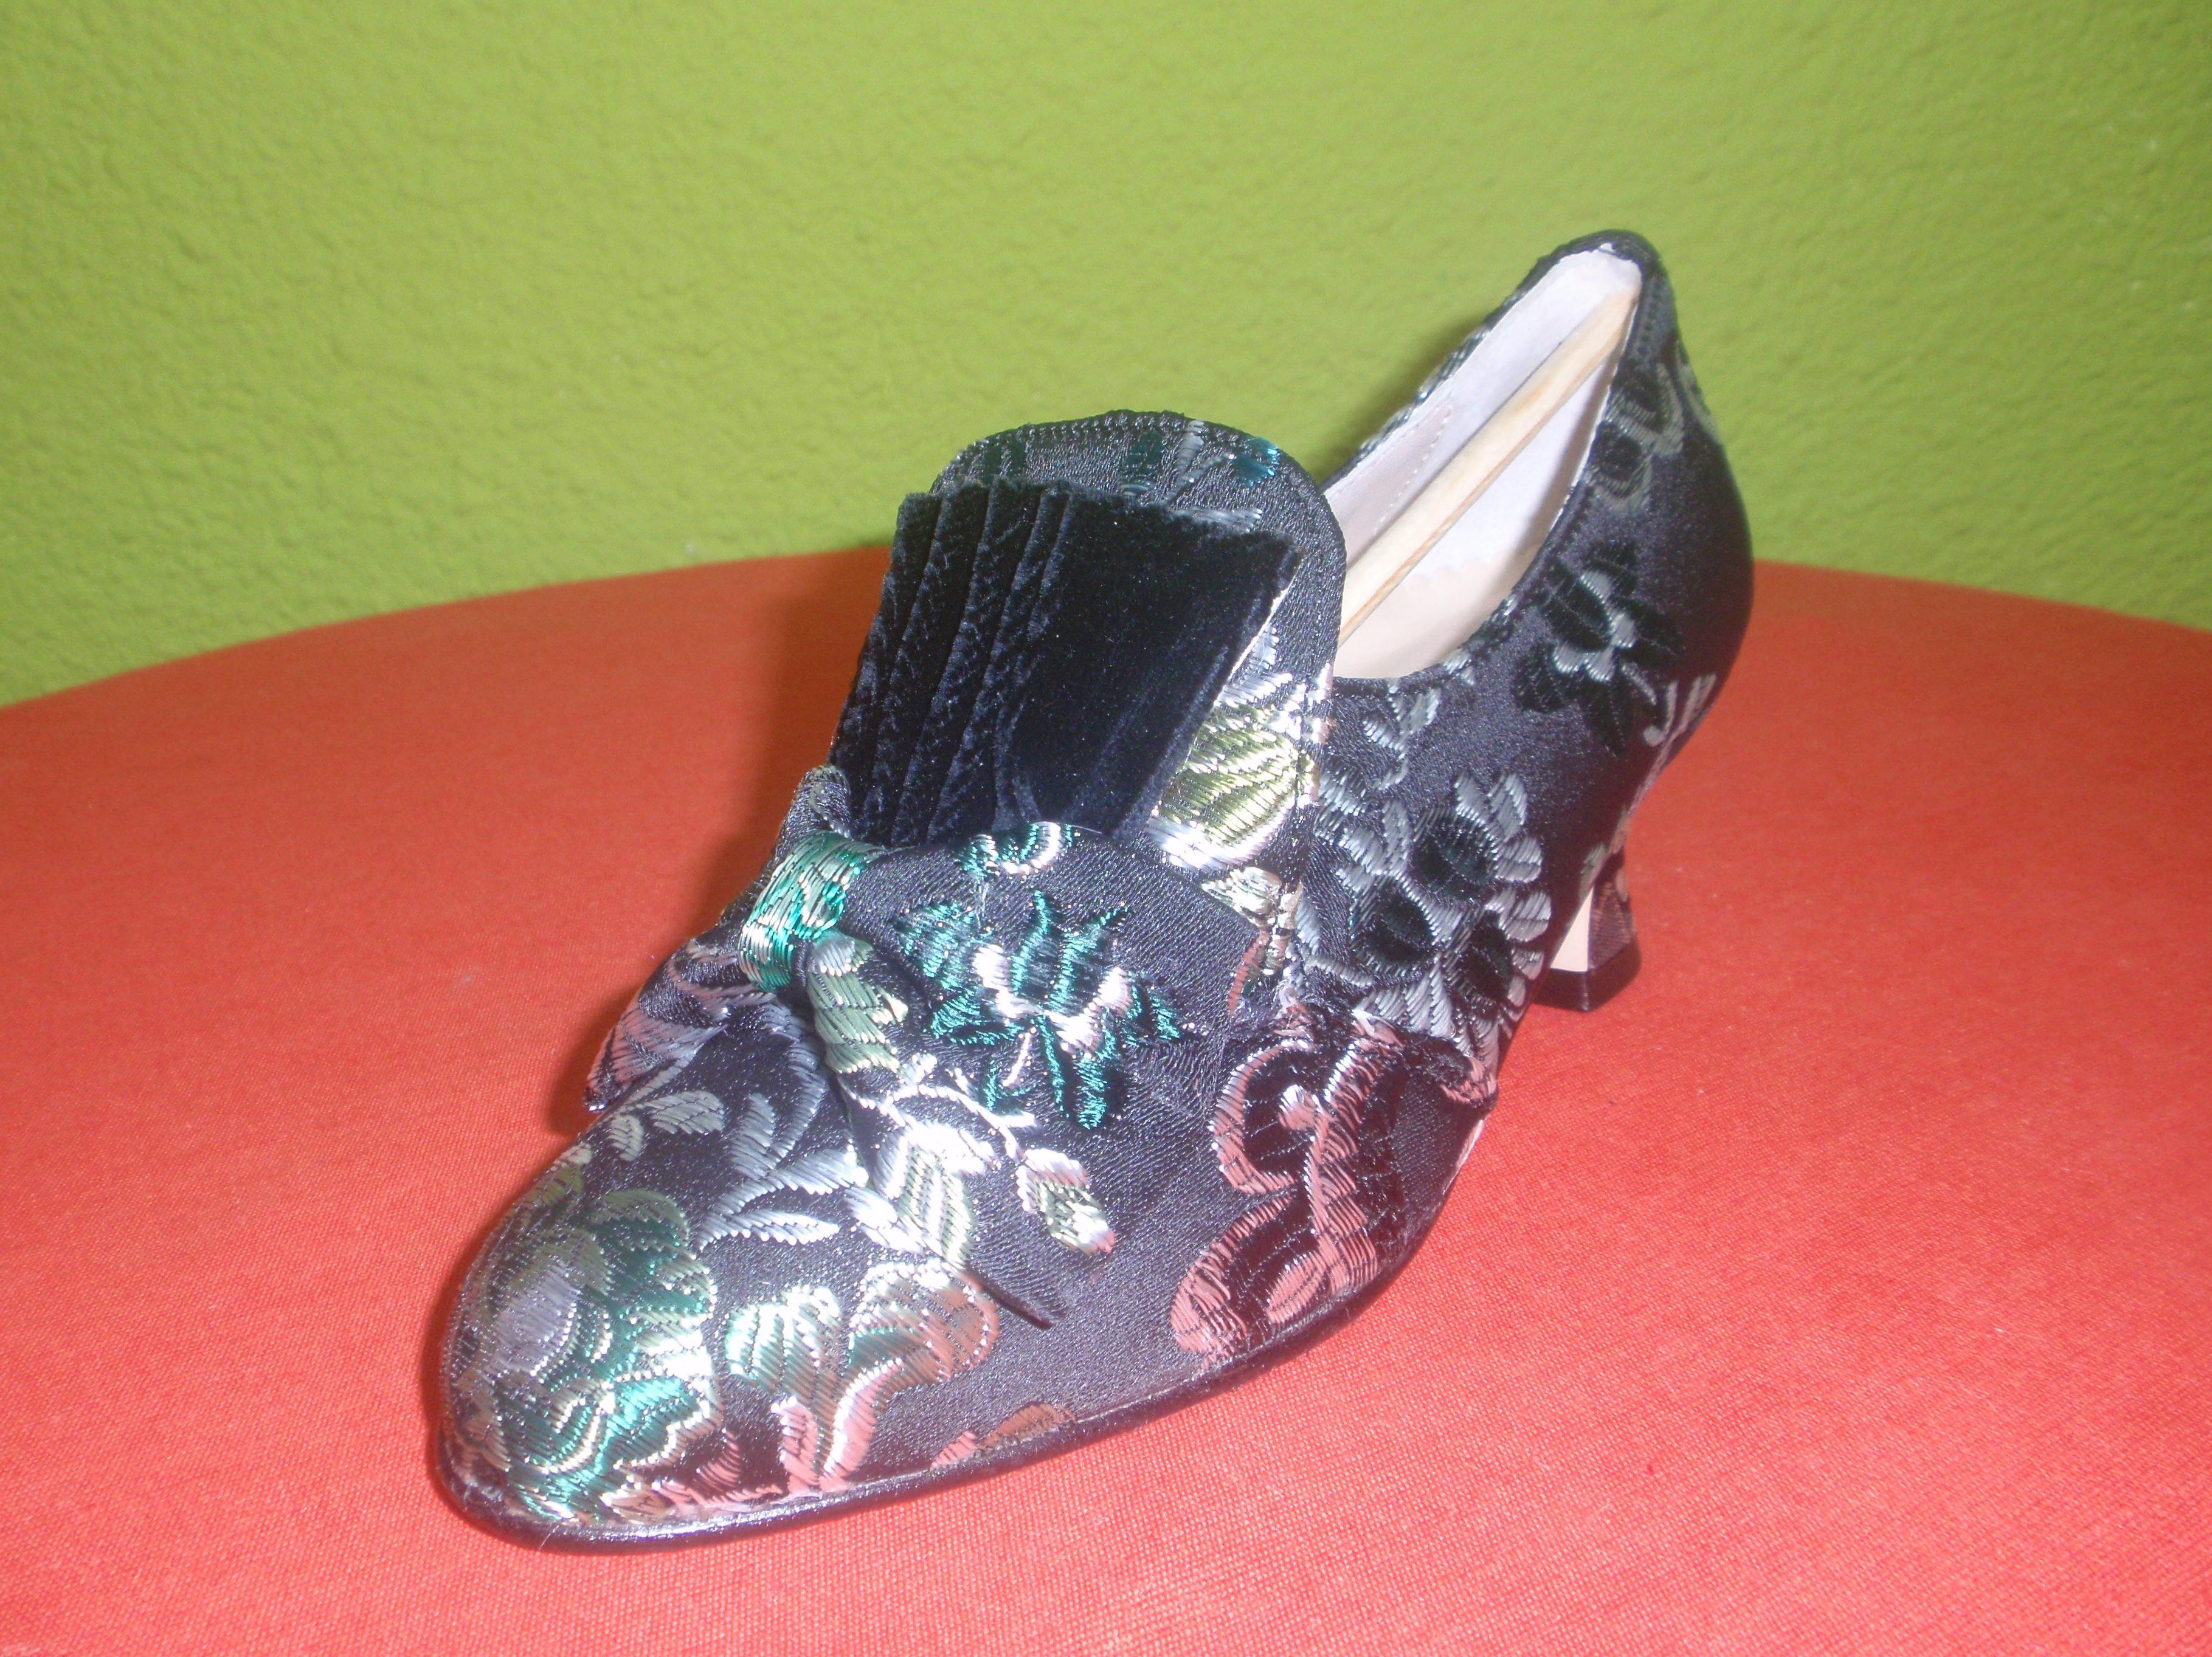 Foto 46 de Reparación de calzado en Castellón   Roig Vidal